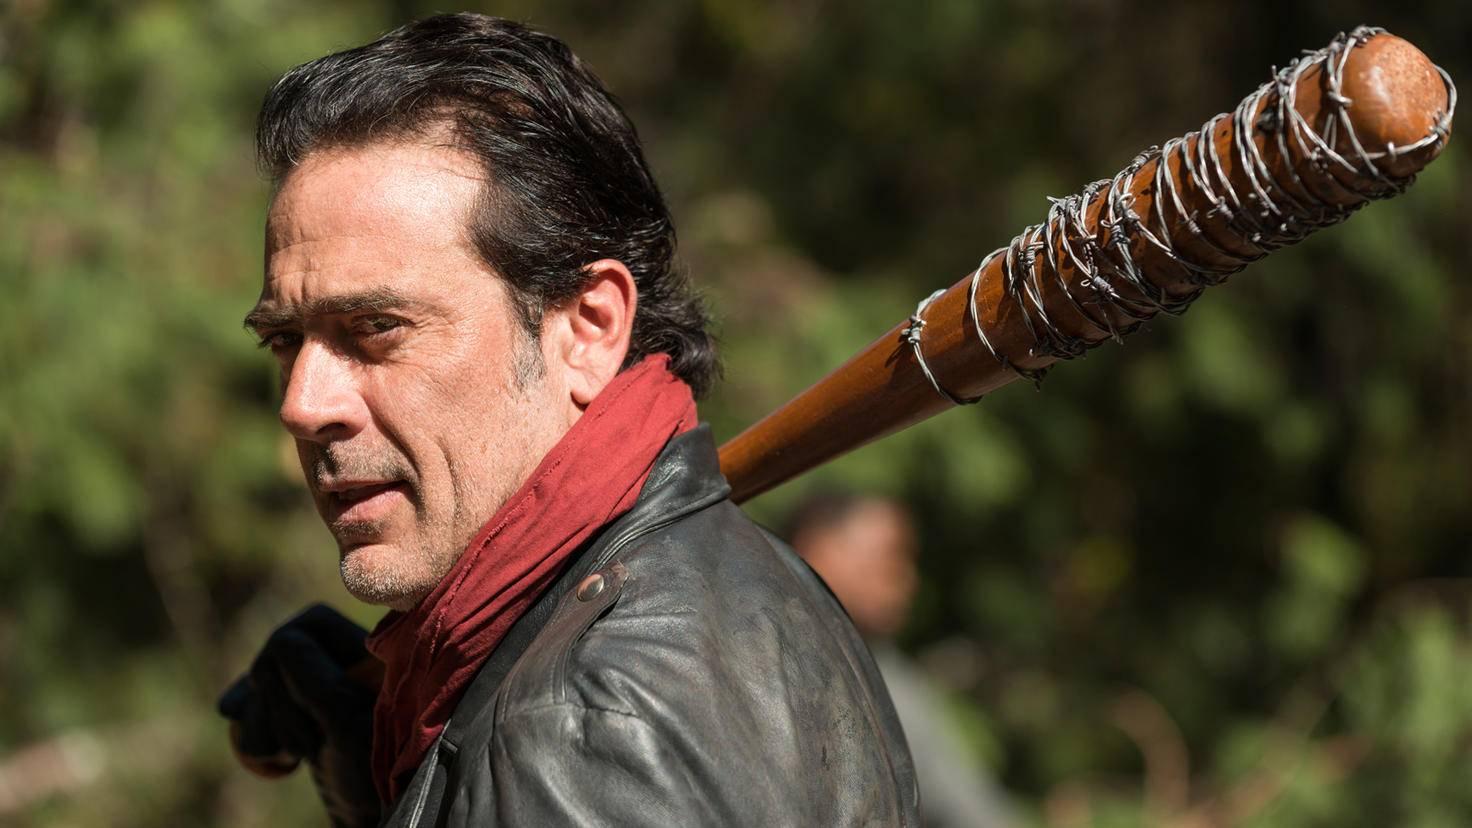 Negan-The Walking Dead-Gene Page-AMC-TWD_716_GP_1107_0115-RT (1)